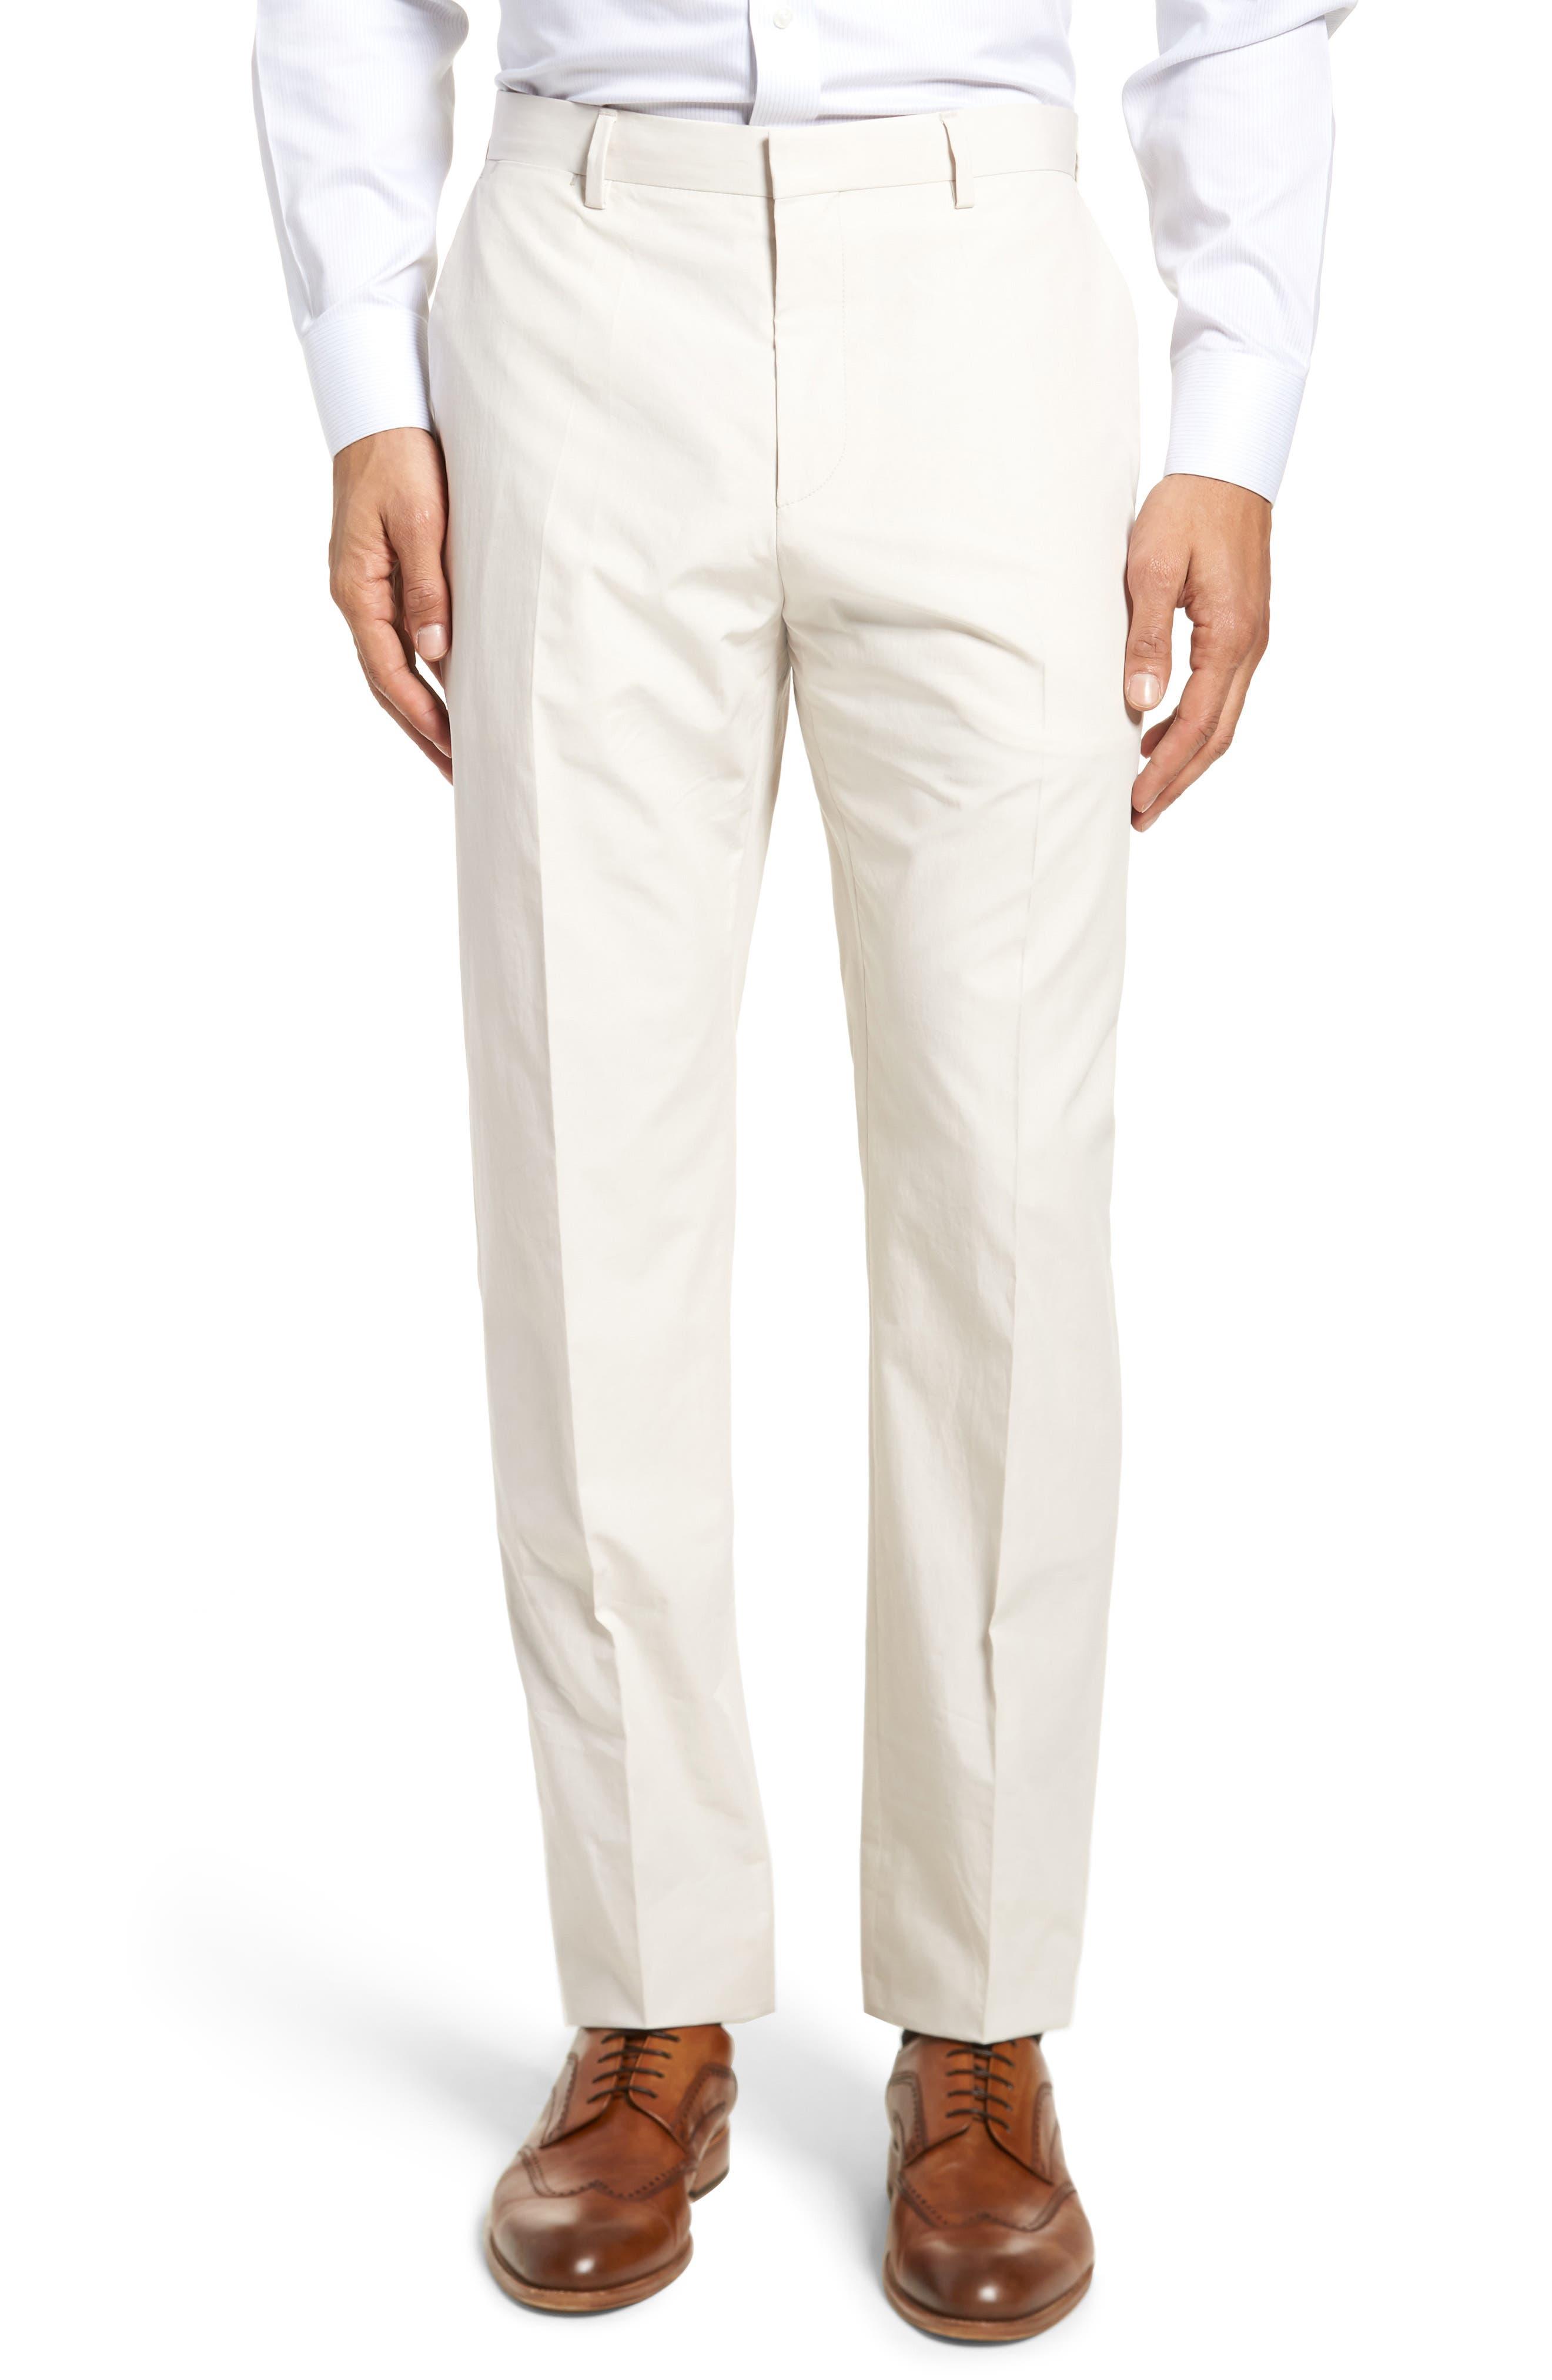 Nylen/Perry Trim Fit Solid Cotton Suit,                             Alternate thumbnail 6, color,                             Ivory